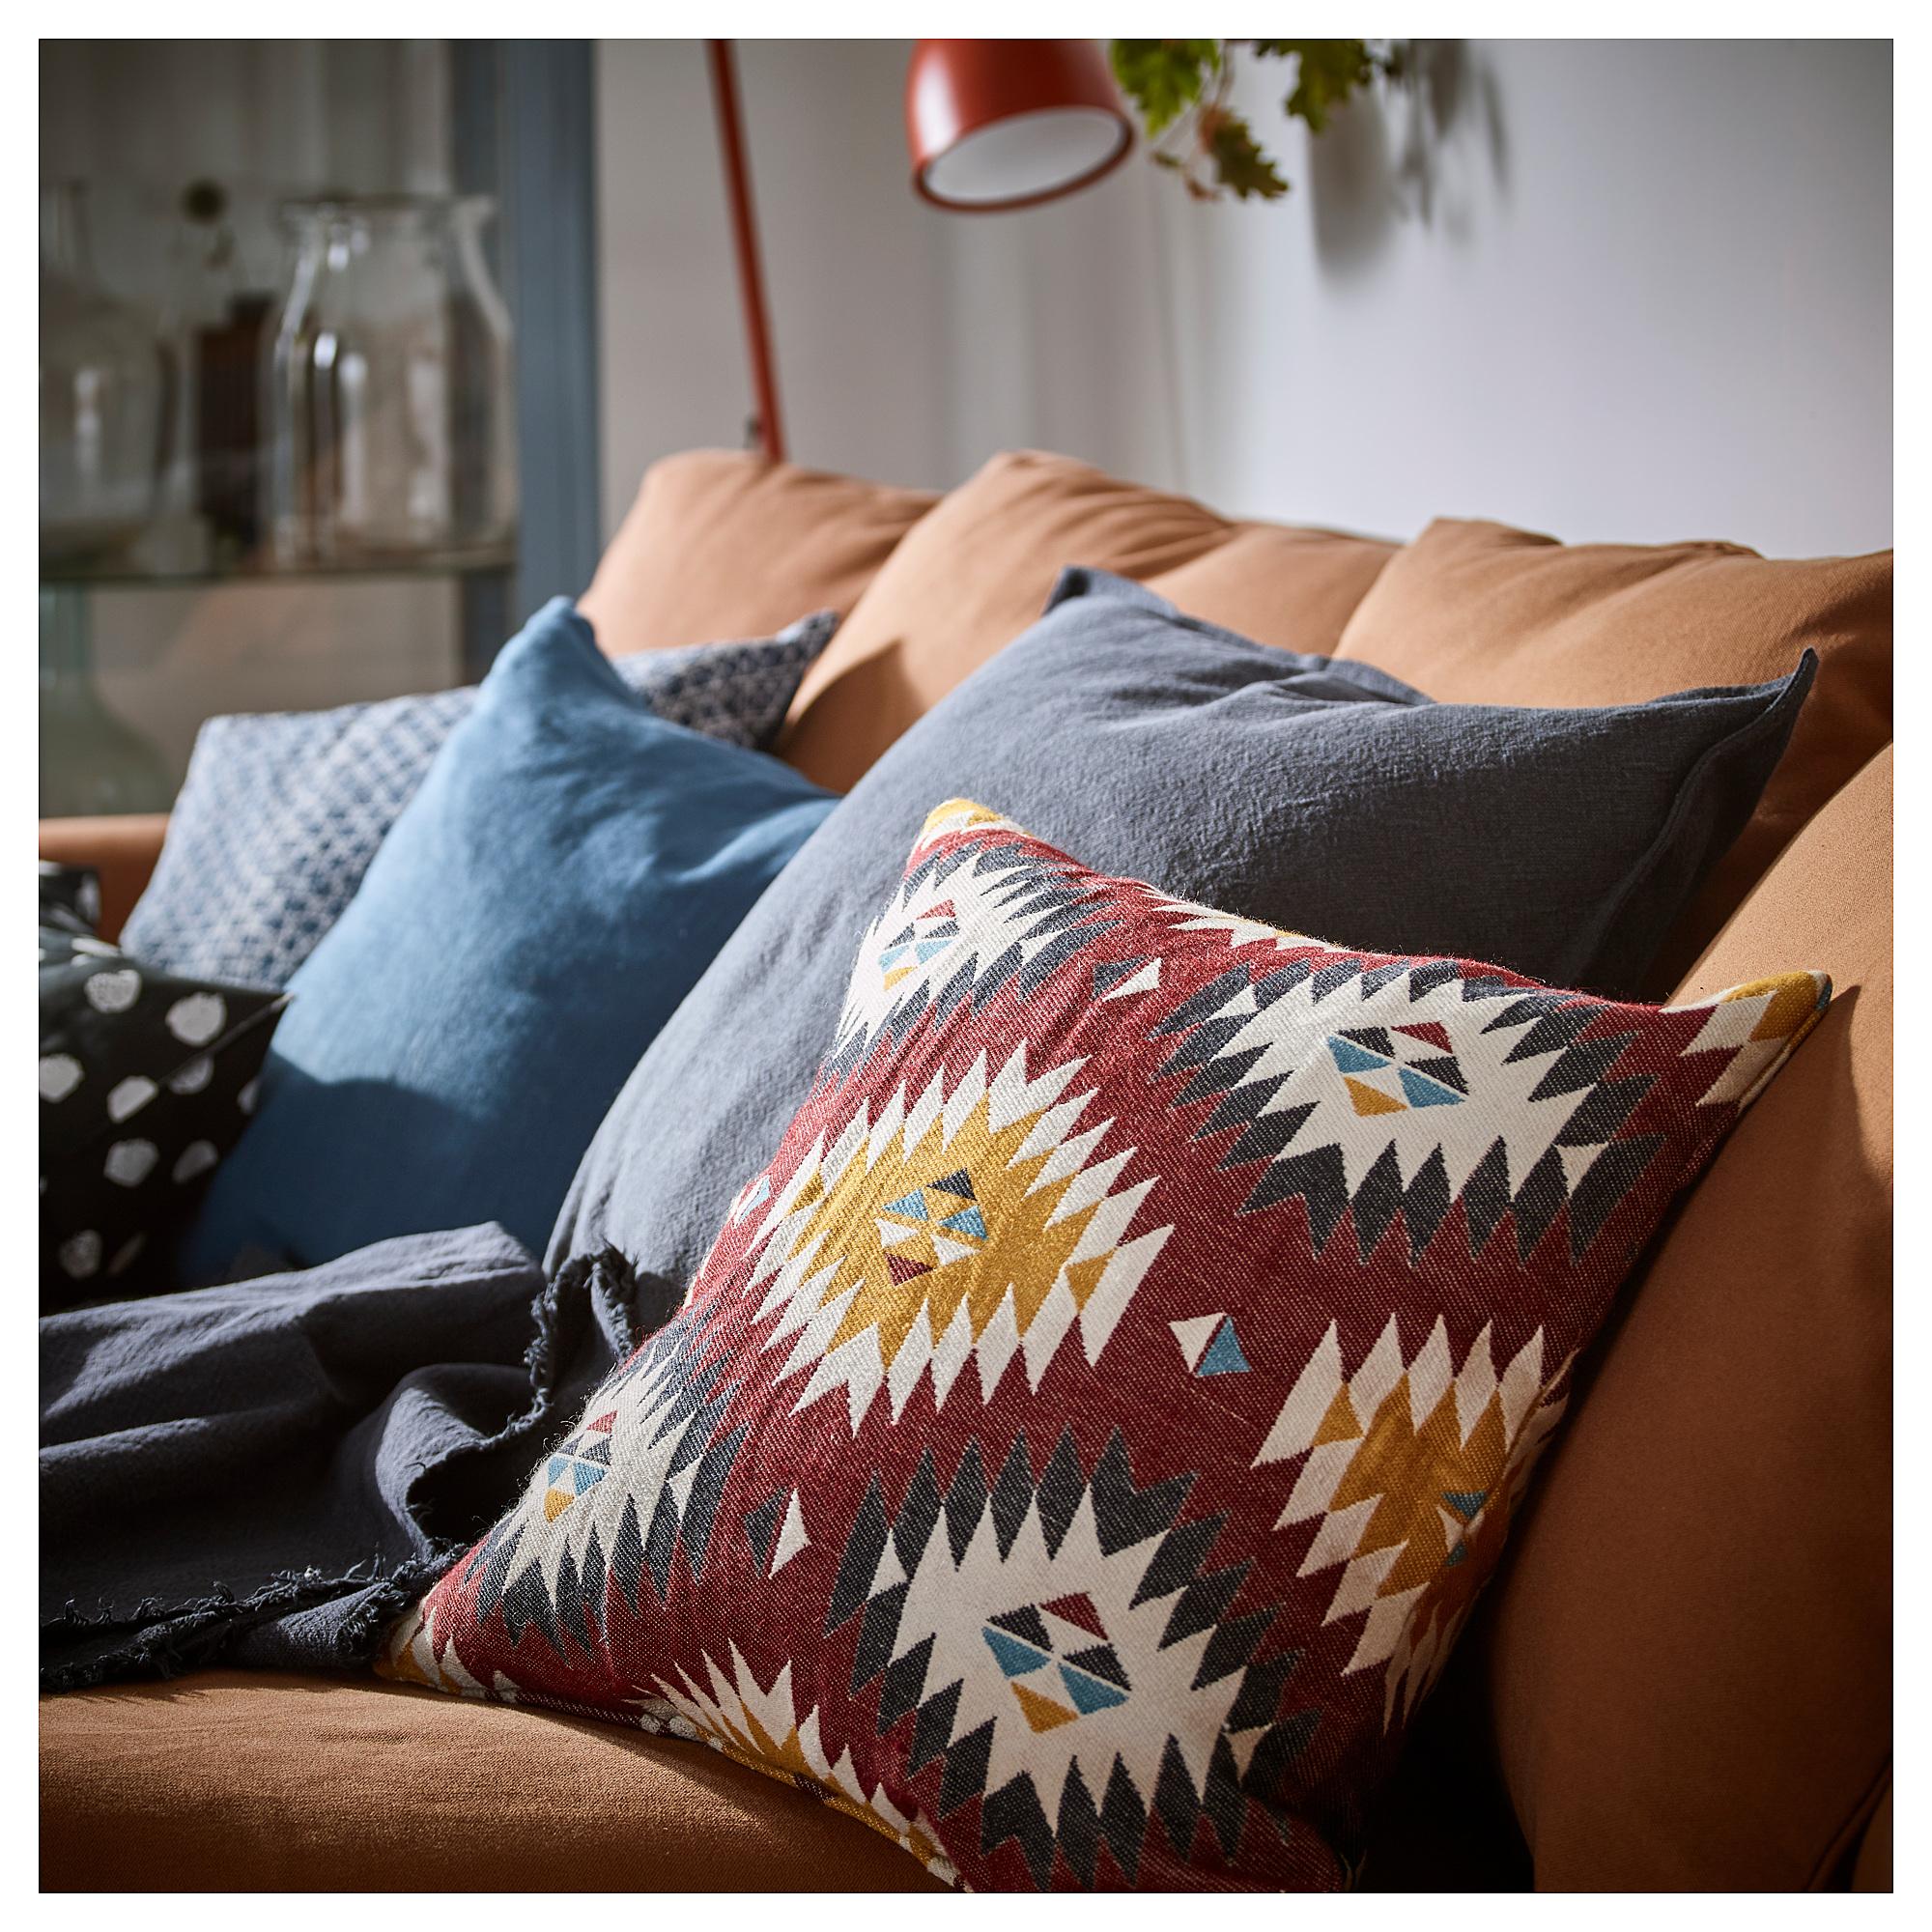 Cuscino Per Pc Ikea.Ikea Fransine Cushion Cover Multicolor Decor Pillows